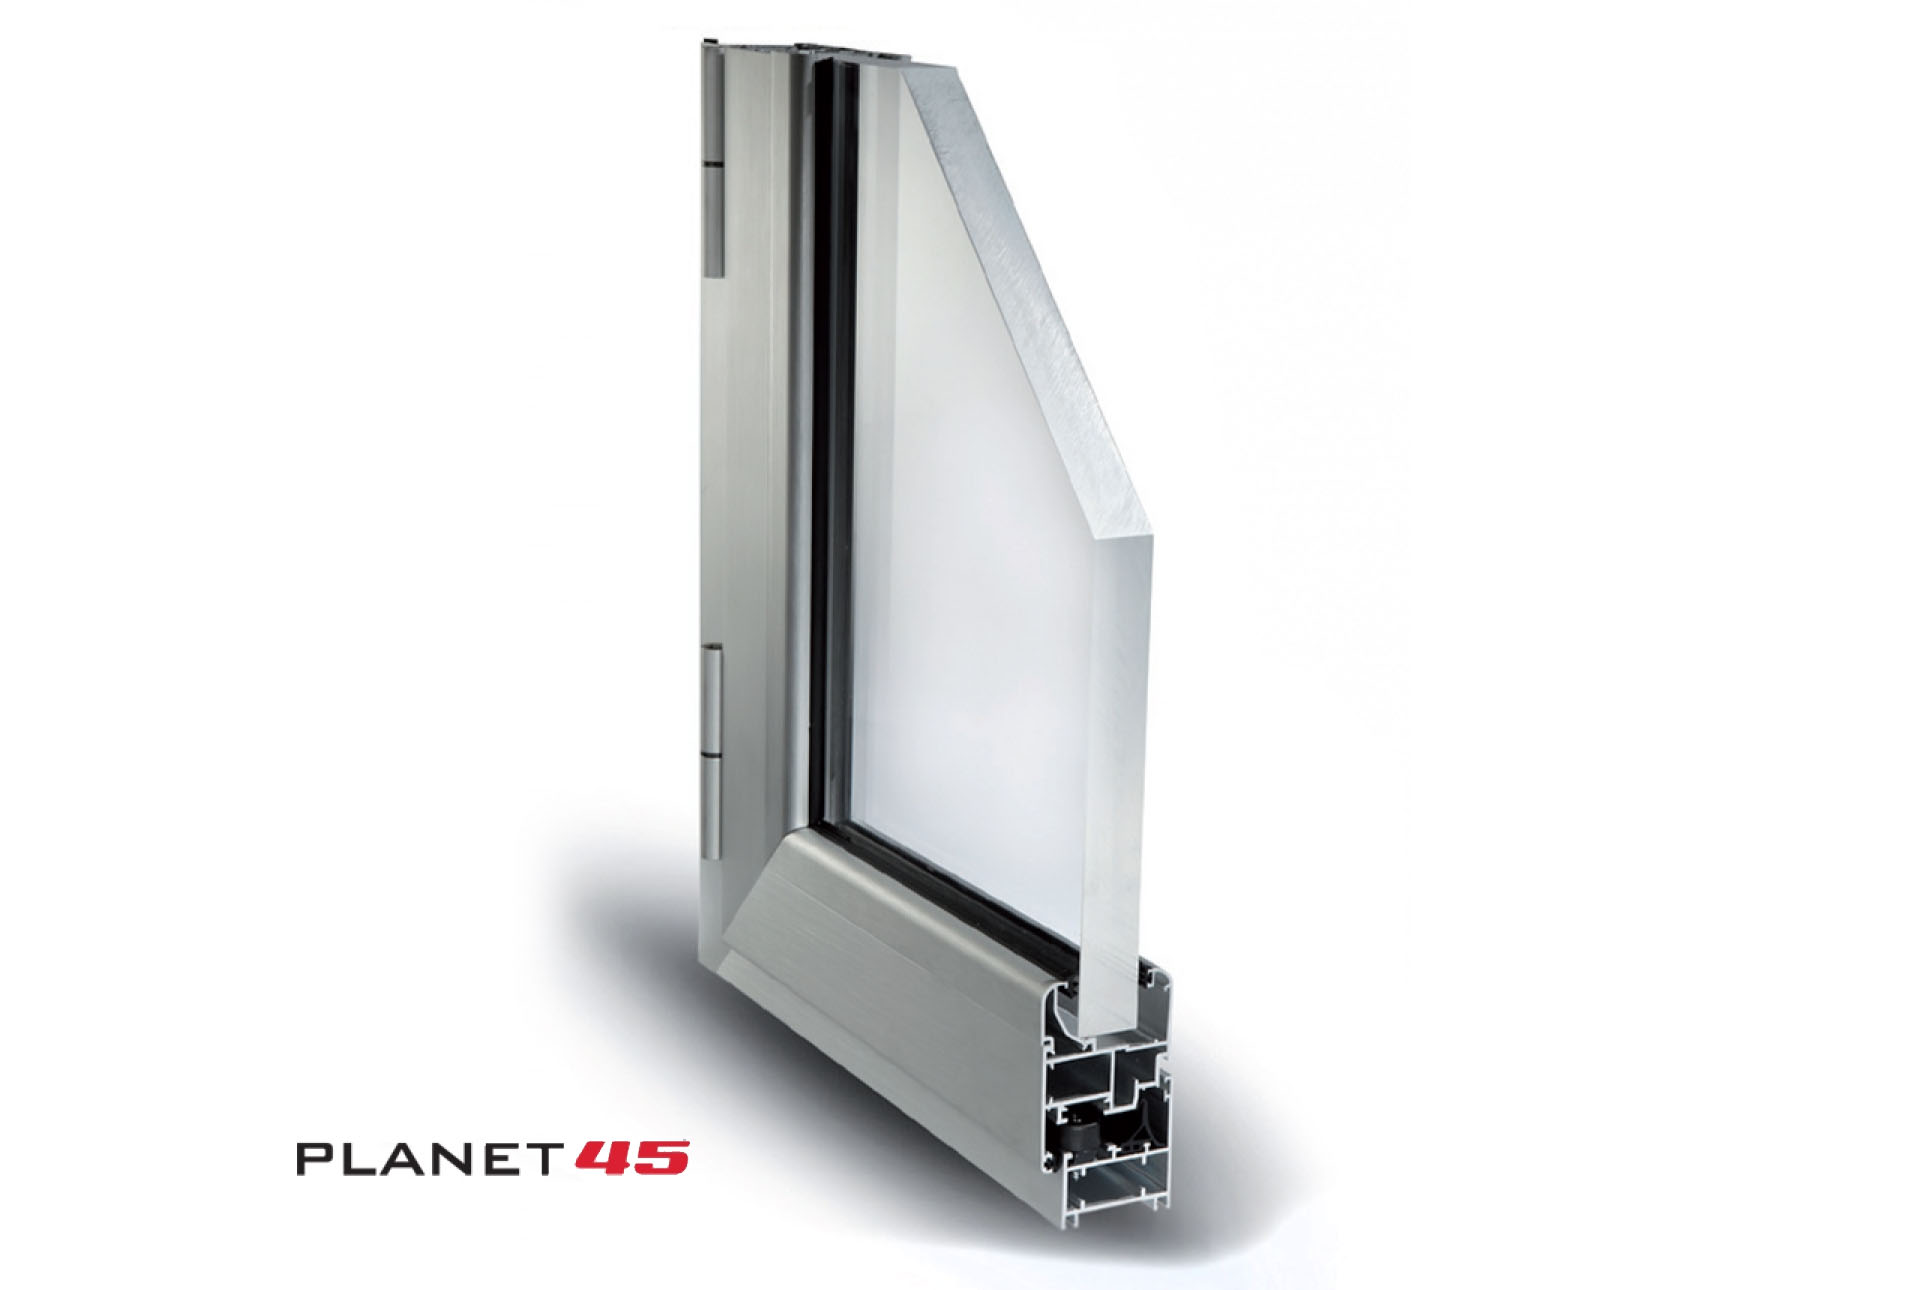 ALsistem Planet 45